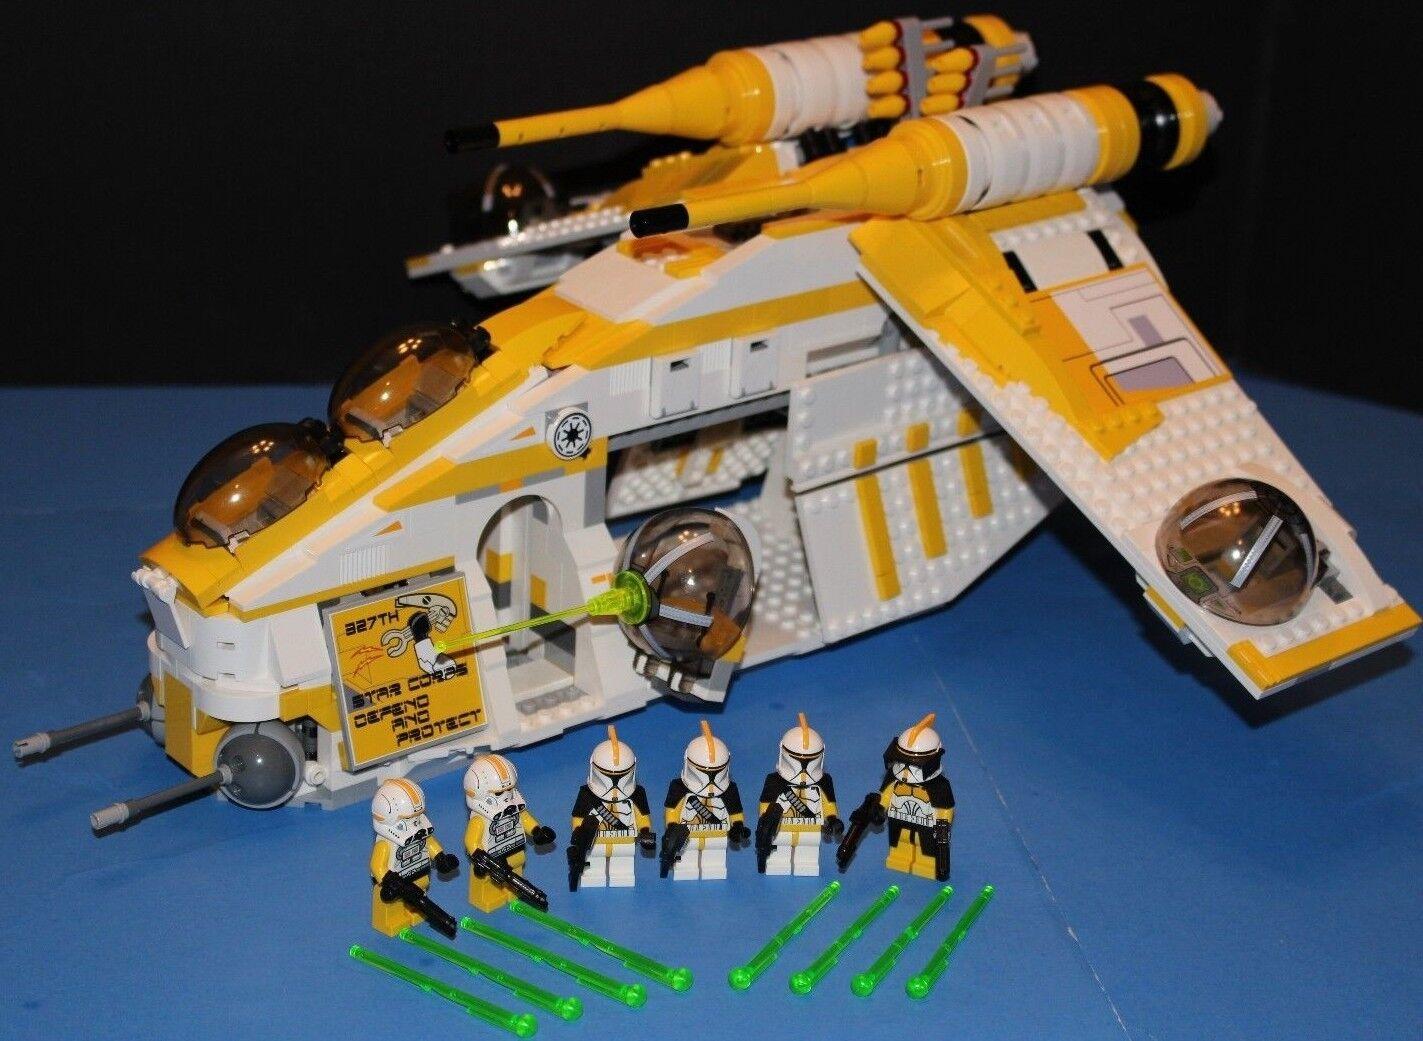 LEGO CREATIVITY PACK +FREE LEGO TOOL S AMAZING MIX X850 PC/'S BULK LOT 1 KG